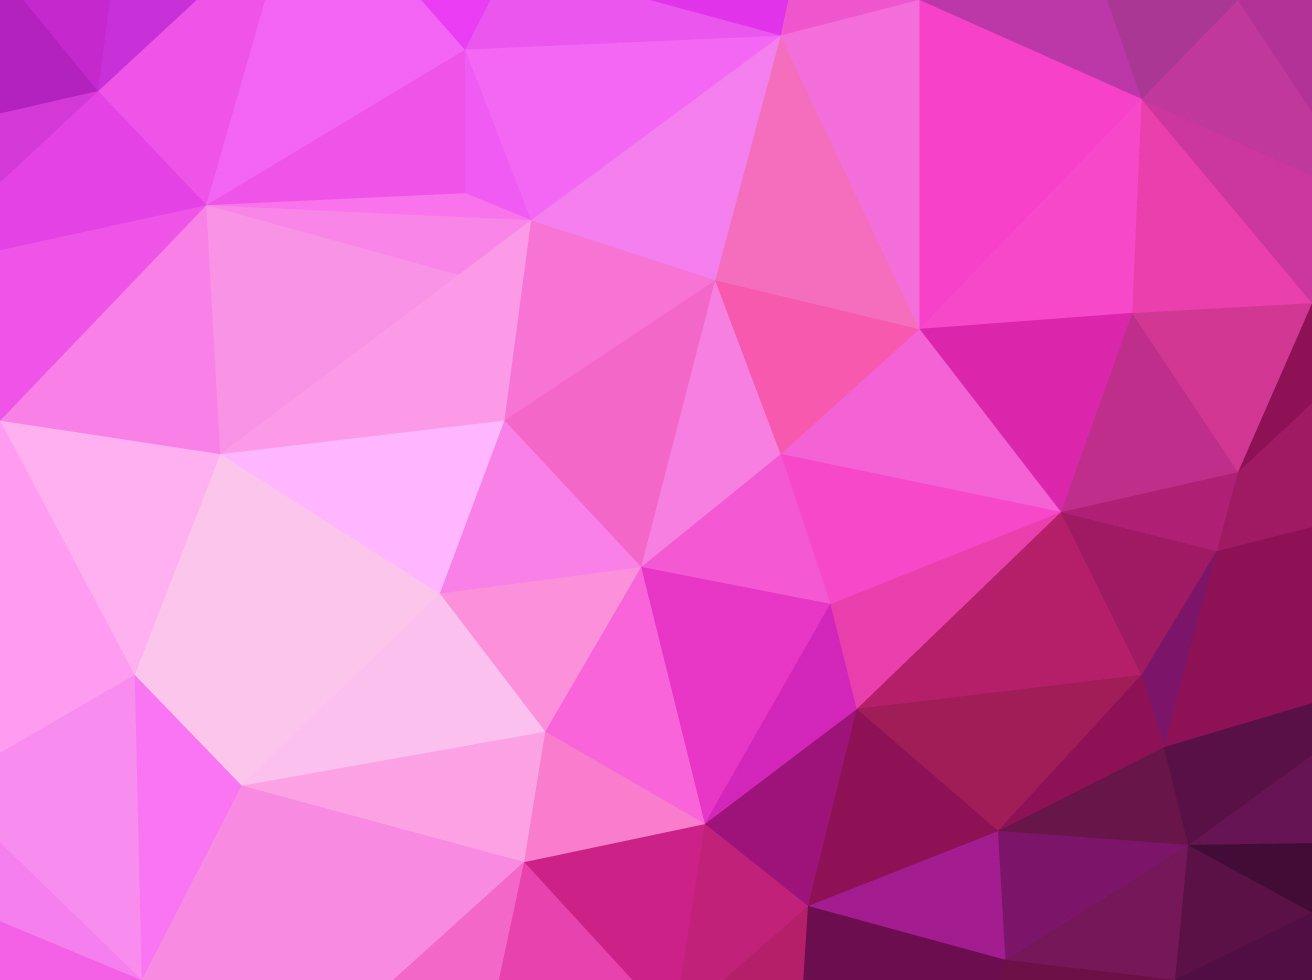 1312x980 Free Pink Background Vector Vector Art Amp Graphics